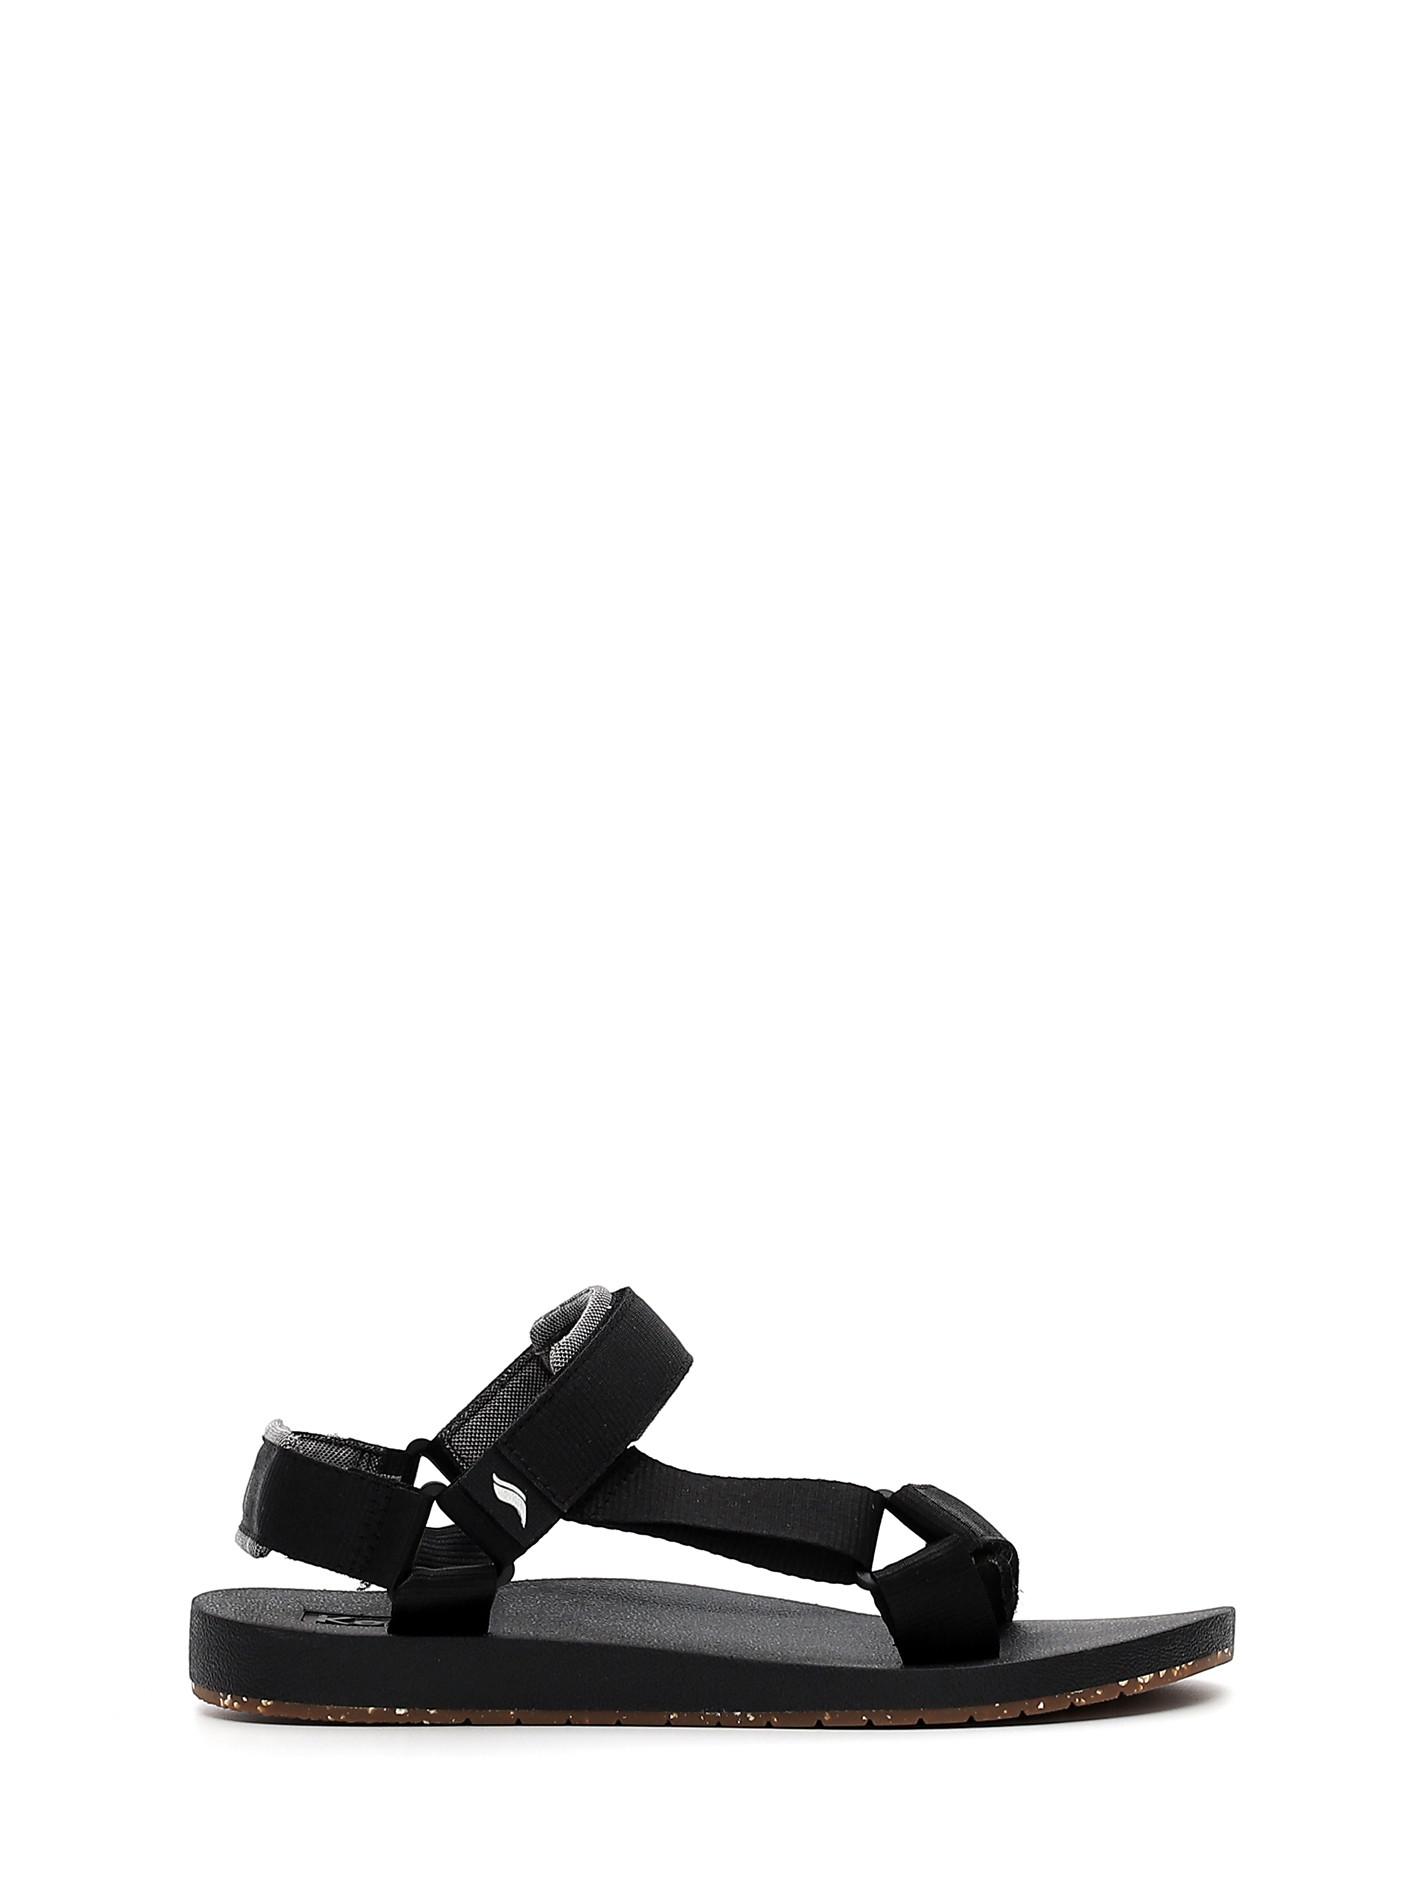 Trio eco sandal - Black